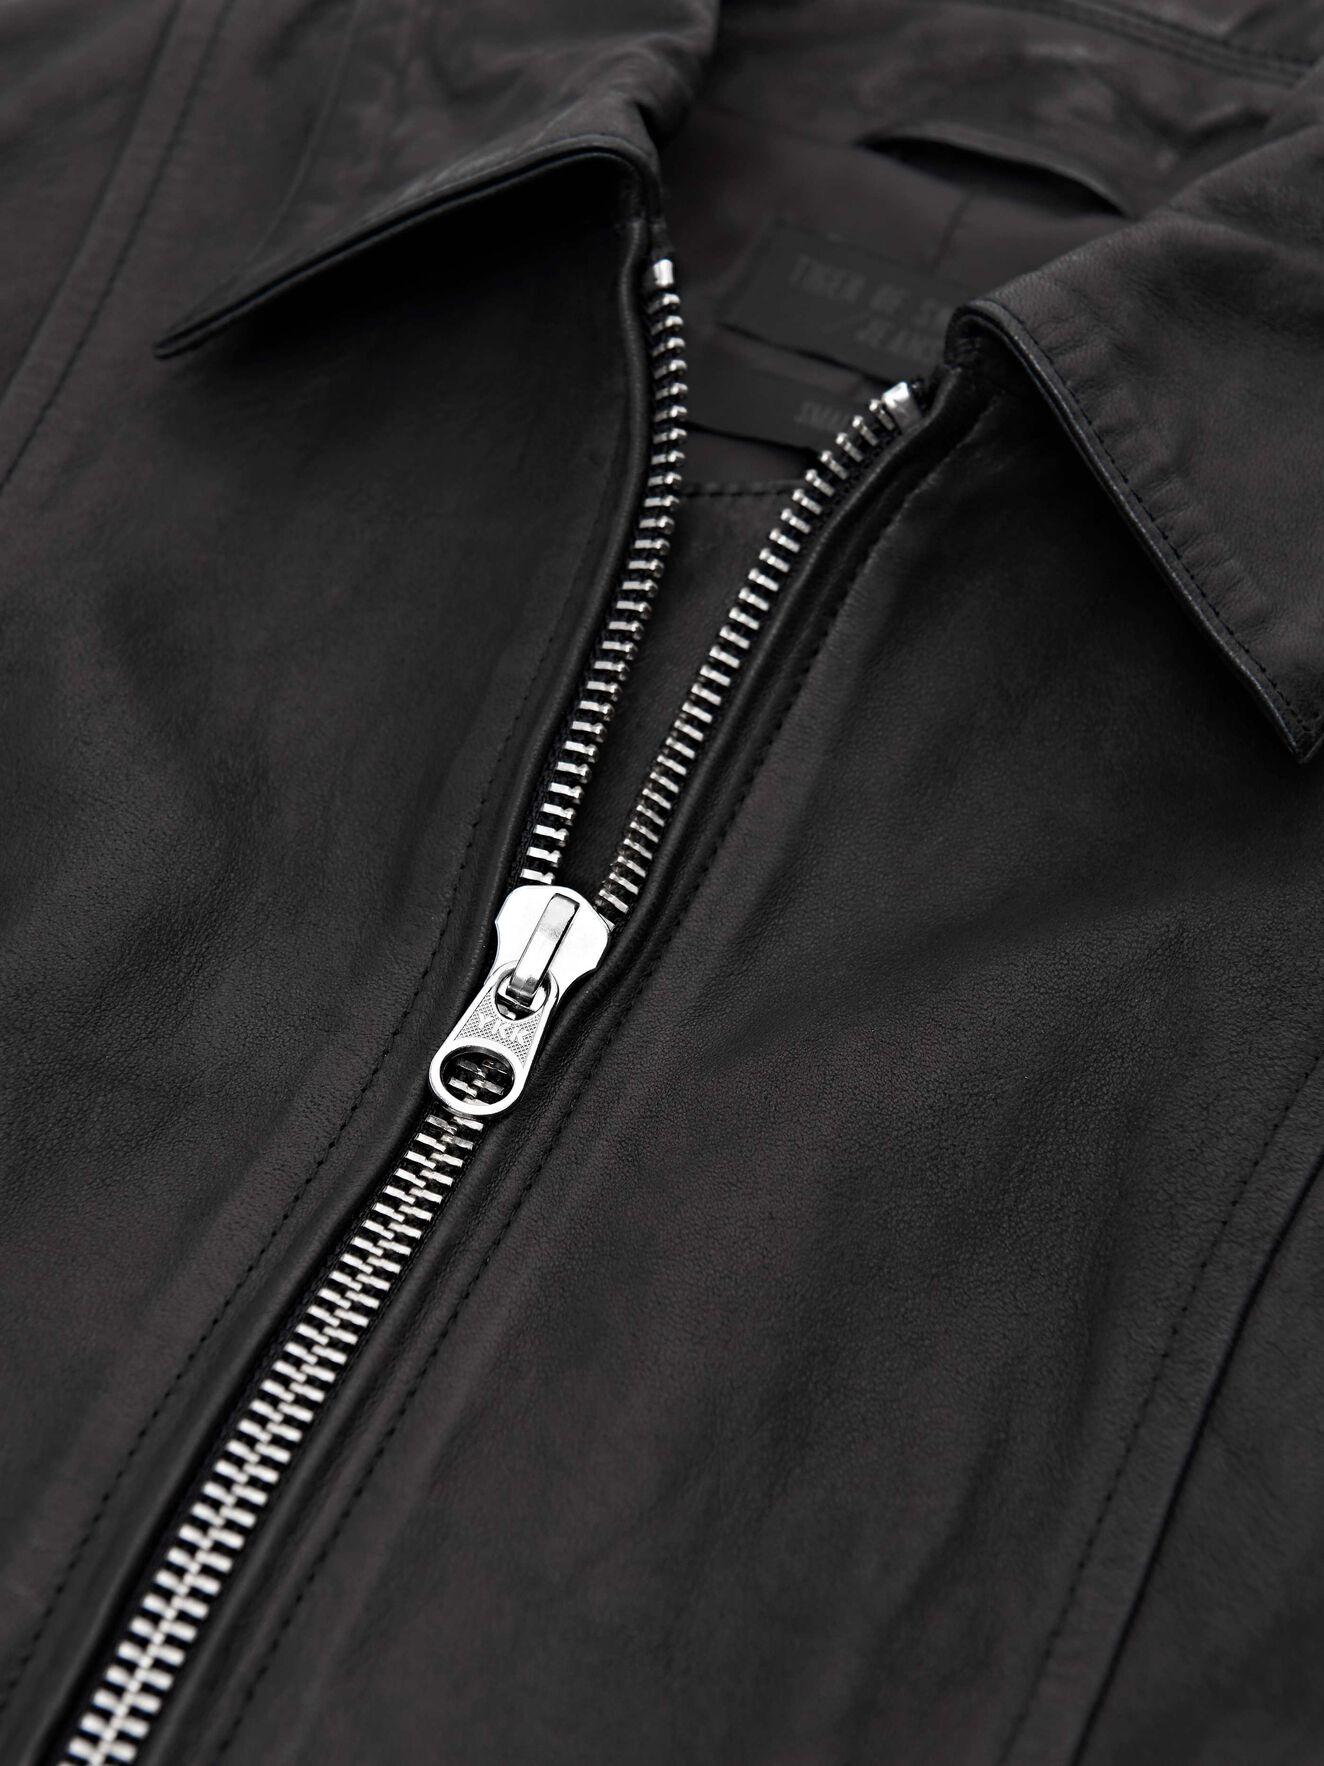 Vanja Jacket in Black from Tiger of Sweden